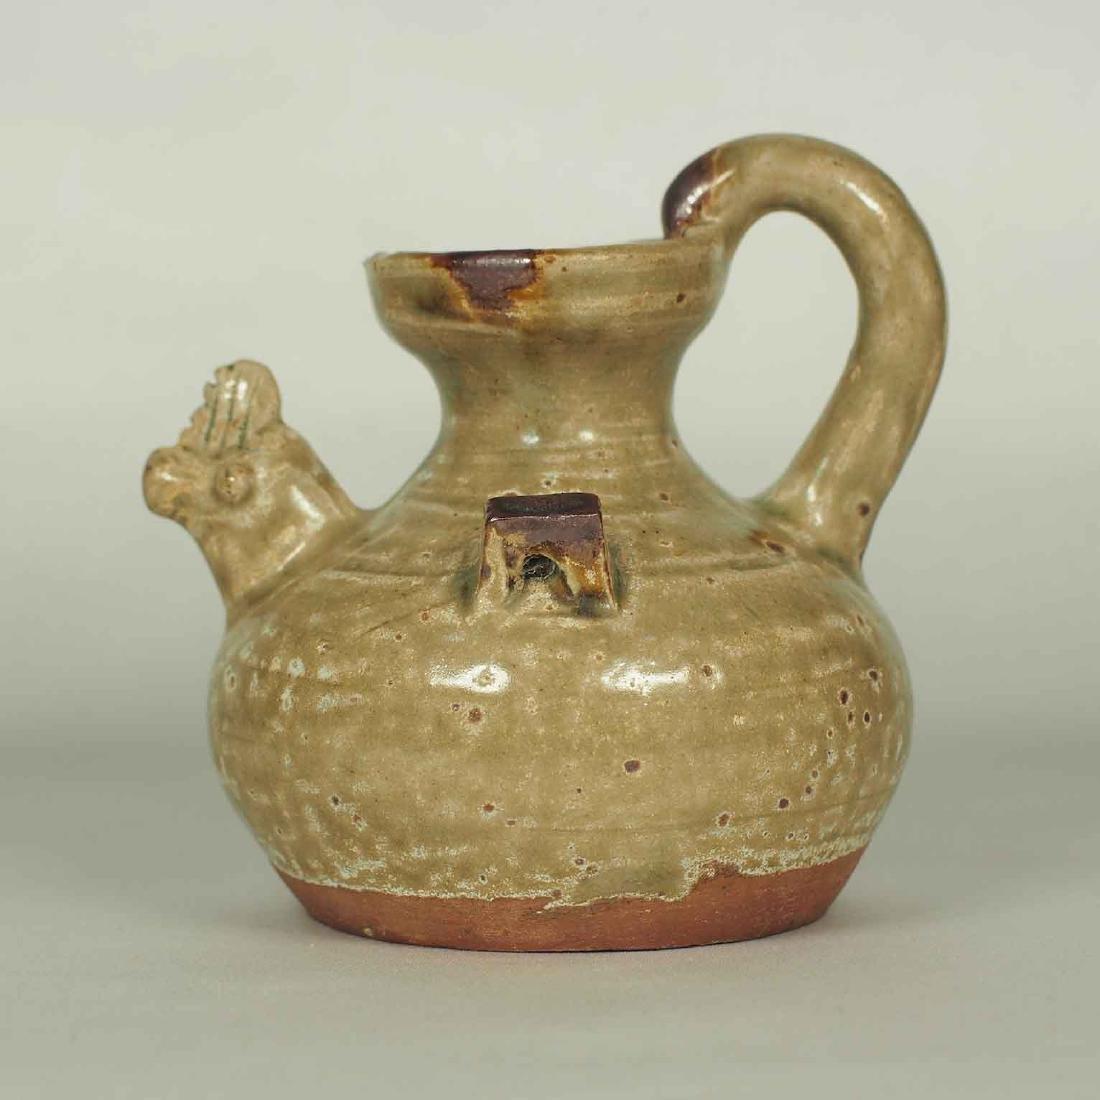 Yue Chicken Head Ewer Water Pot with Brown Spot,